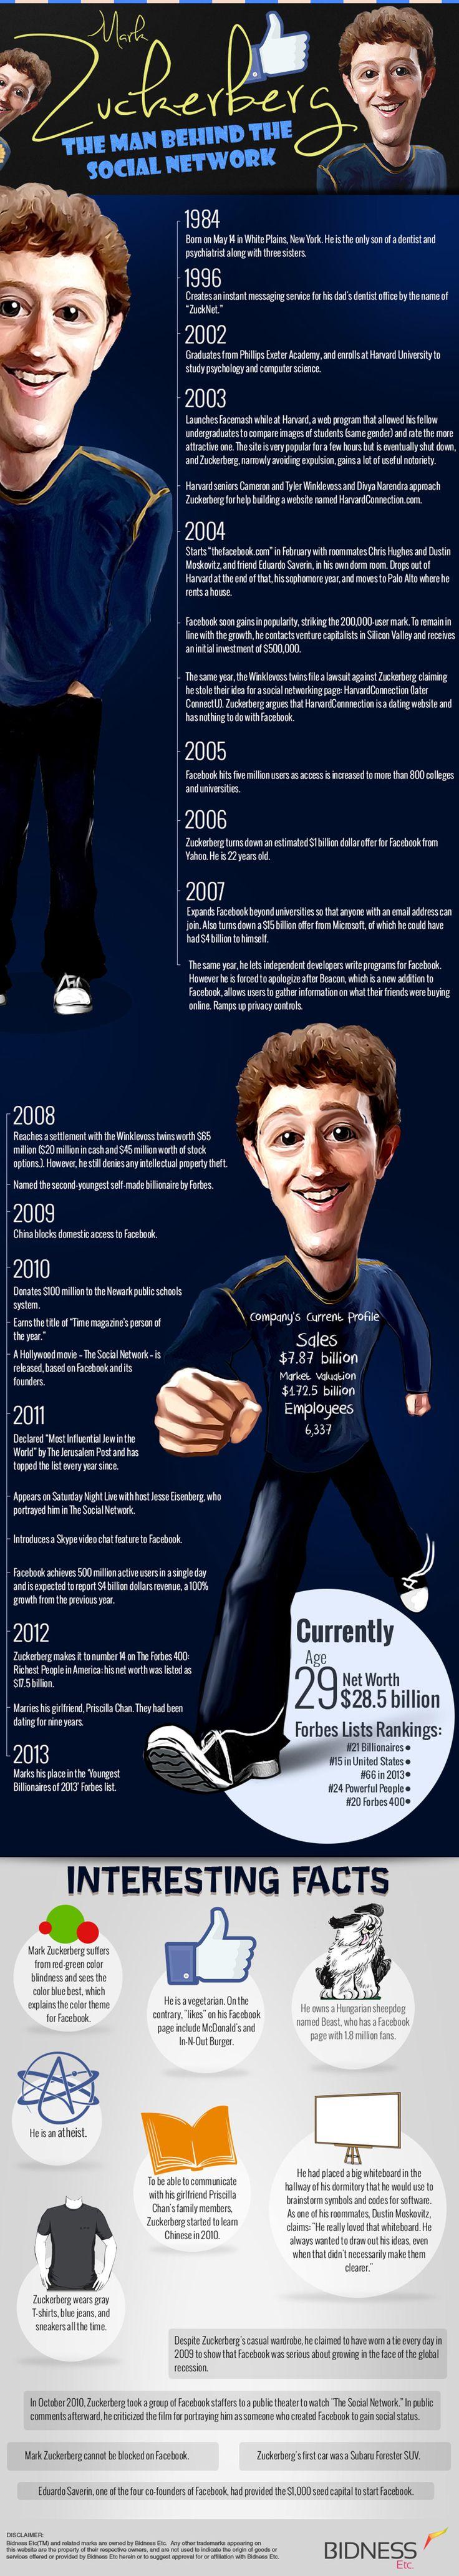 Life History of Mark Zuckerberg Infographic #facebook #socialmedia #ceo